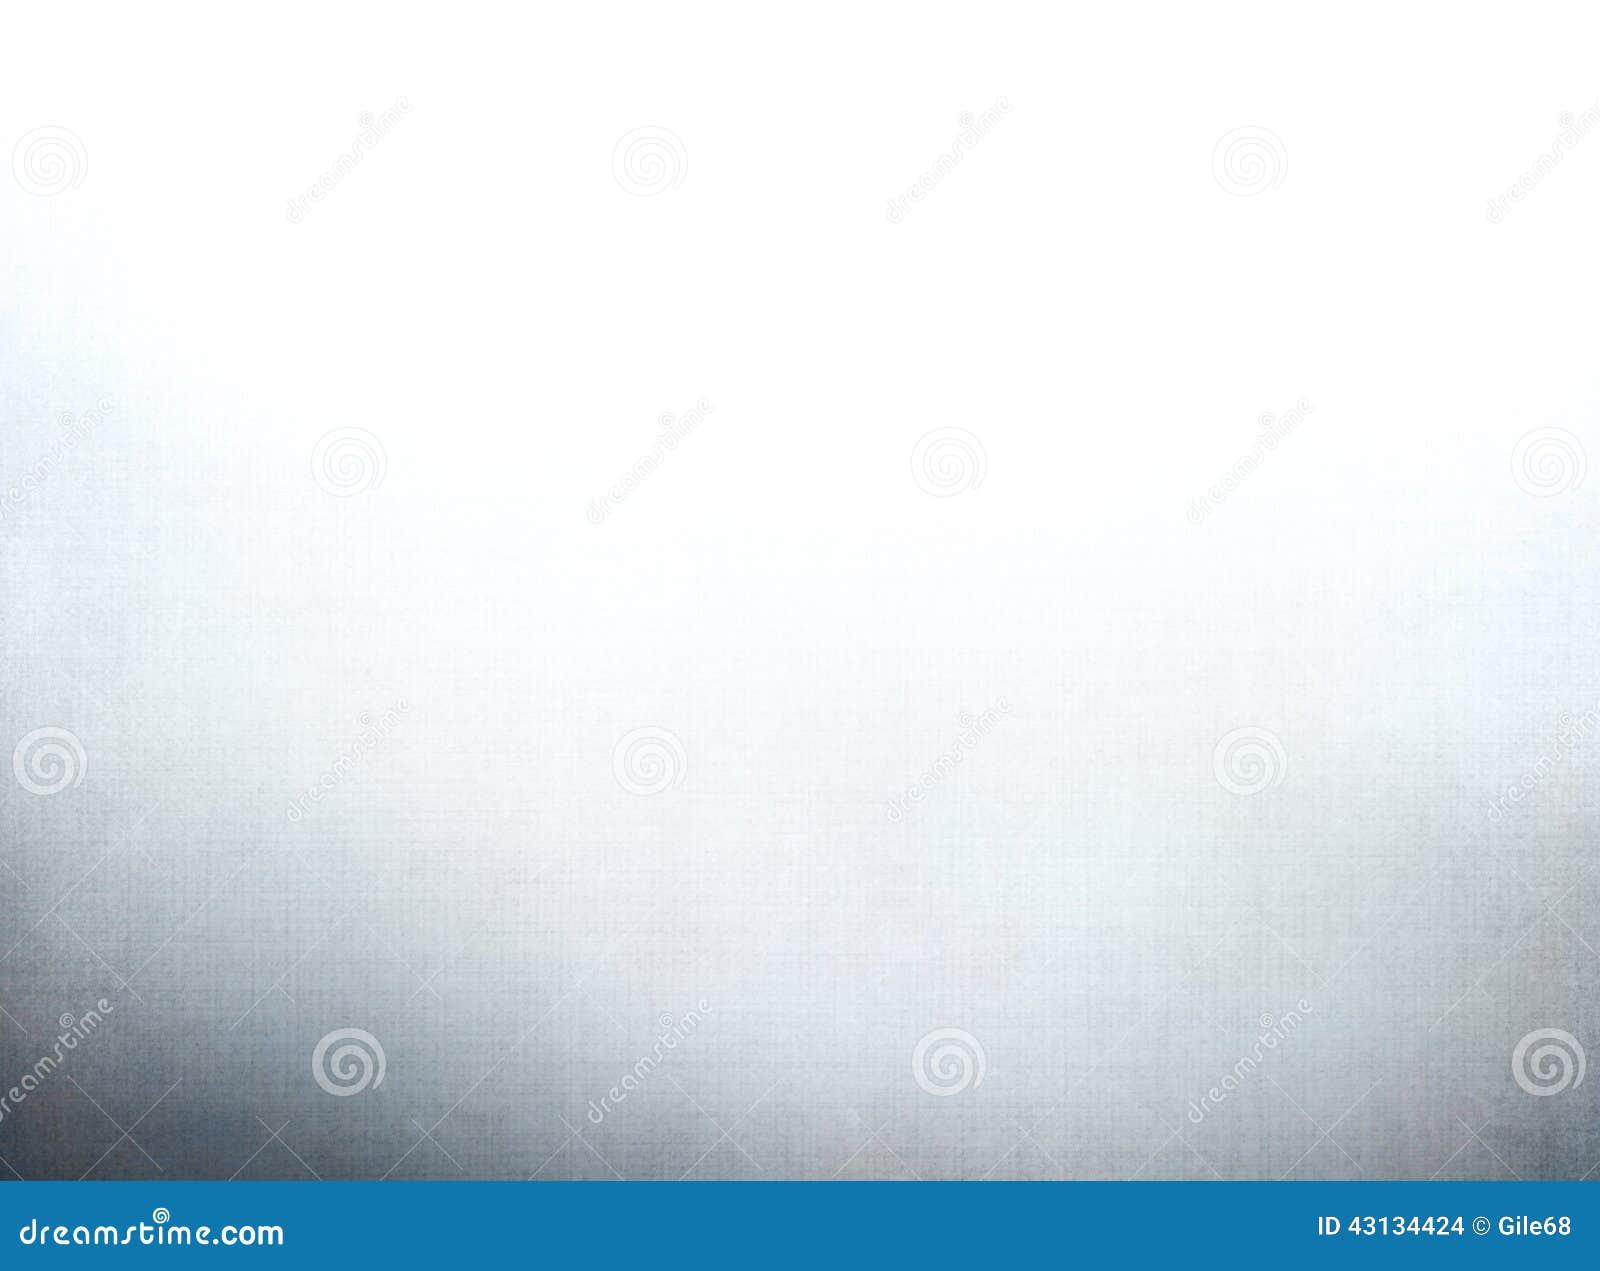 light gray background design - photo #40